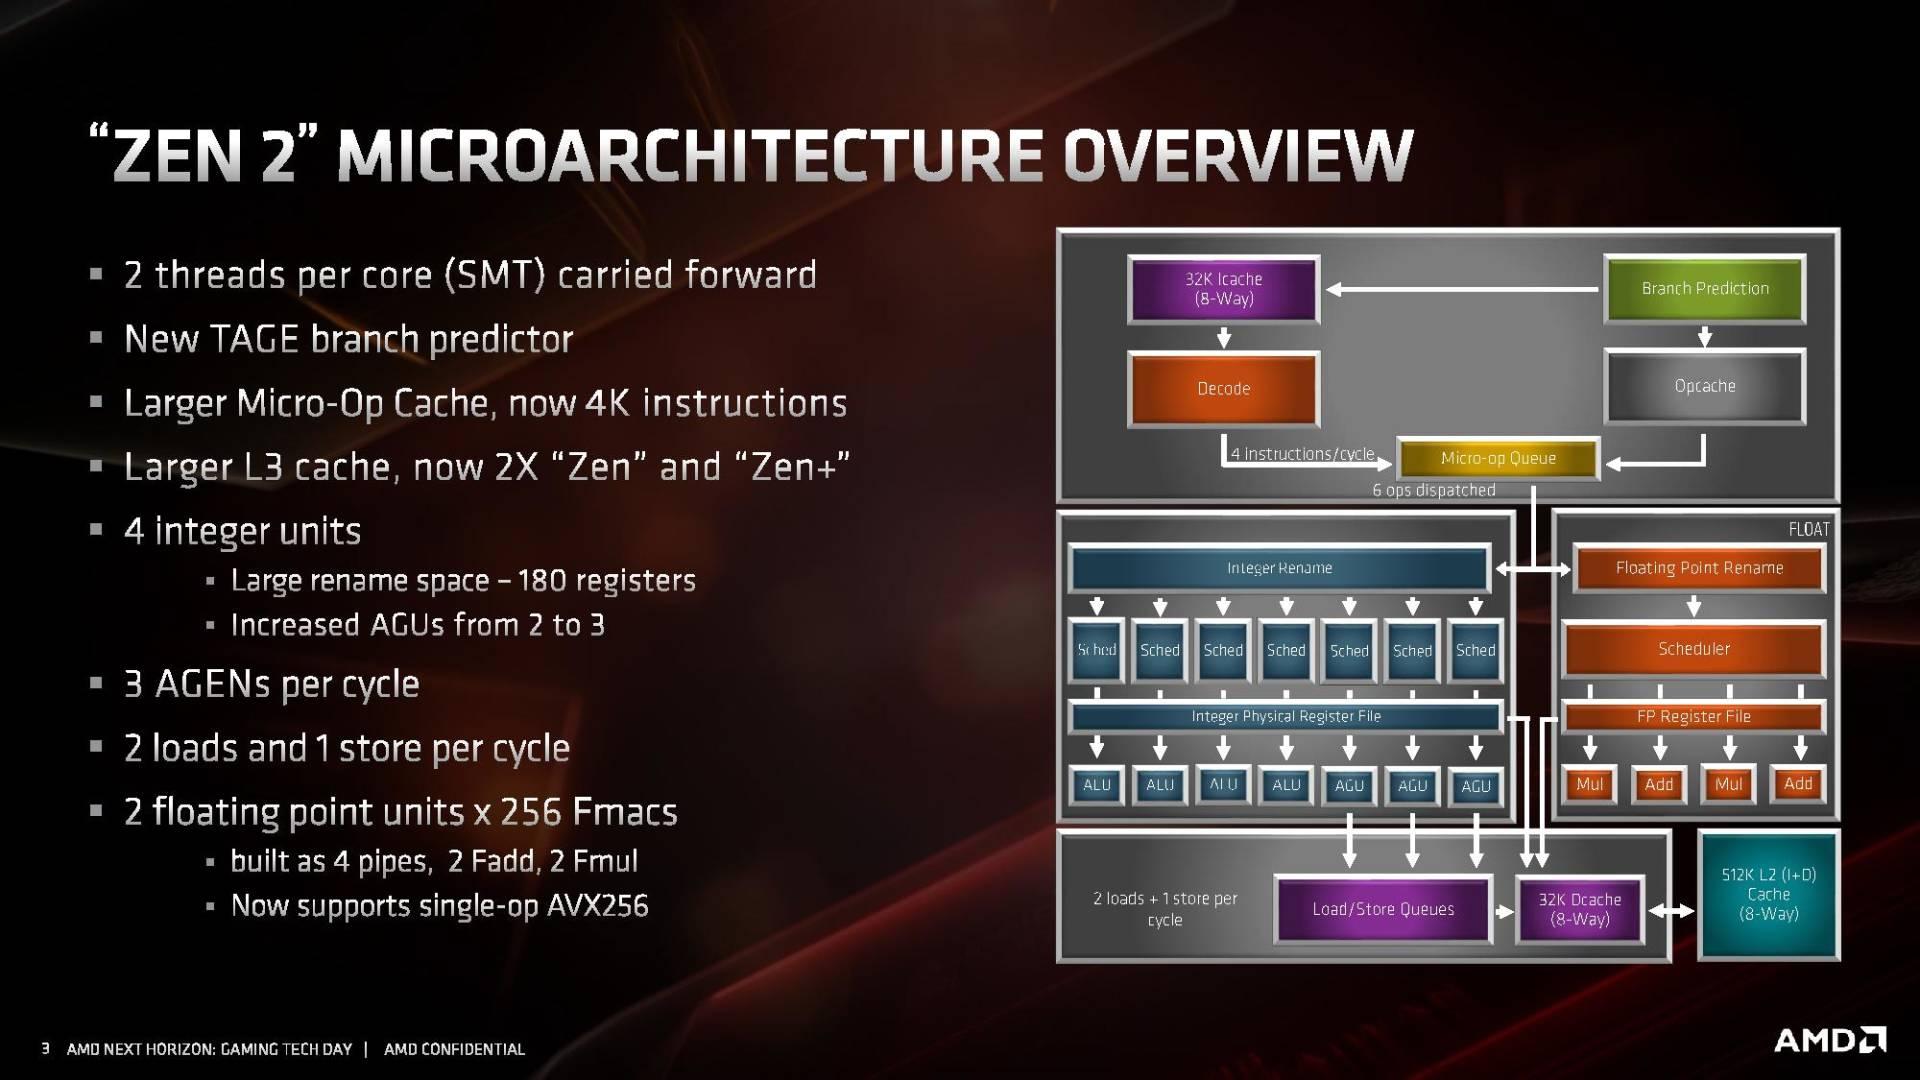 AMD Architettura Zen 2 slide